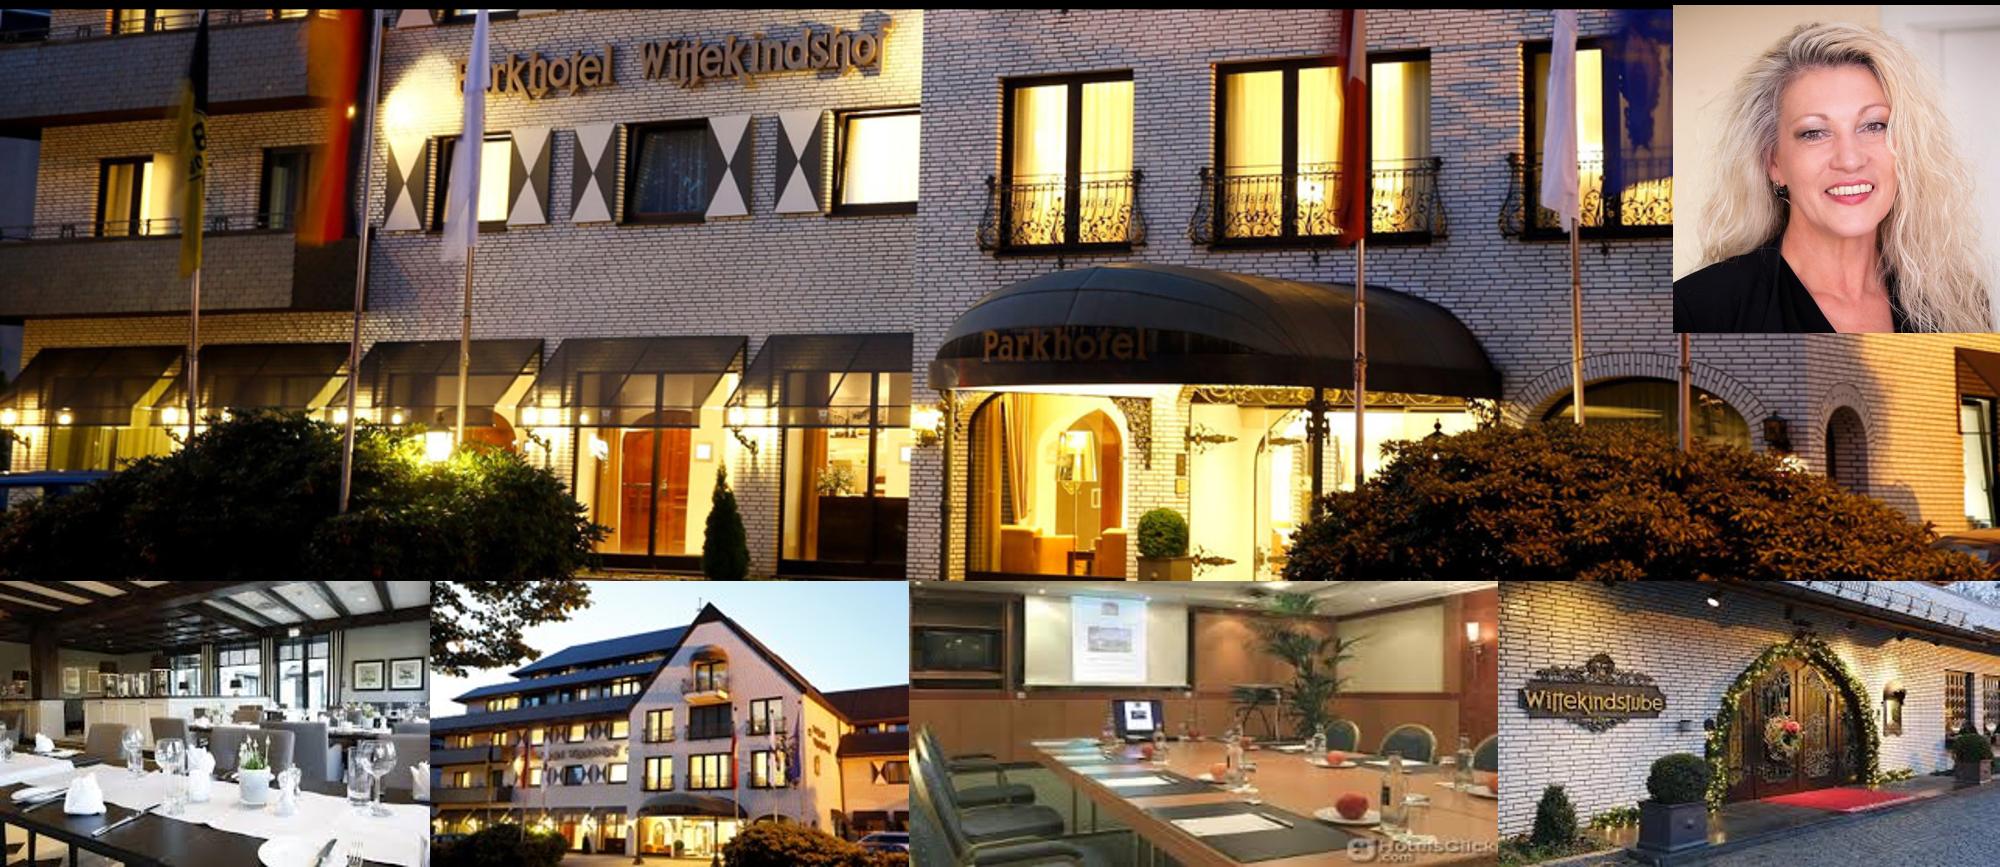 Dortmund Wittekindshof